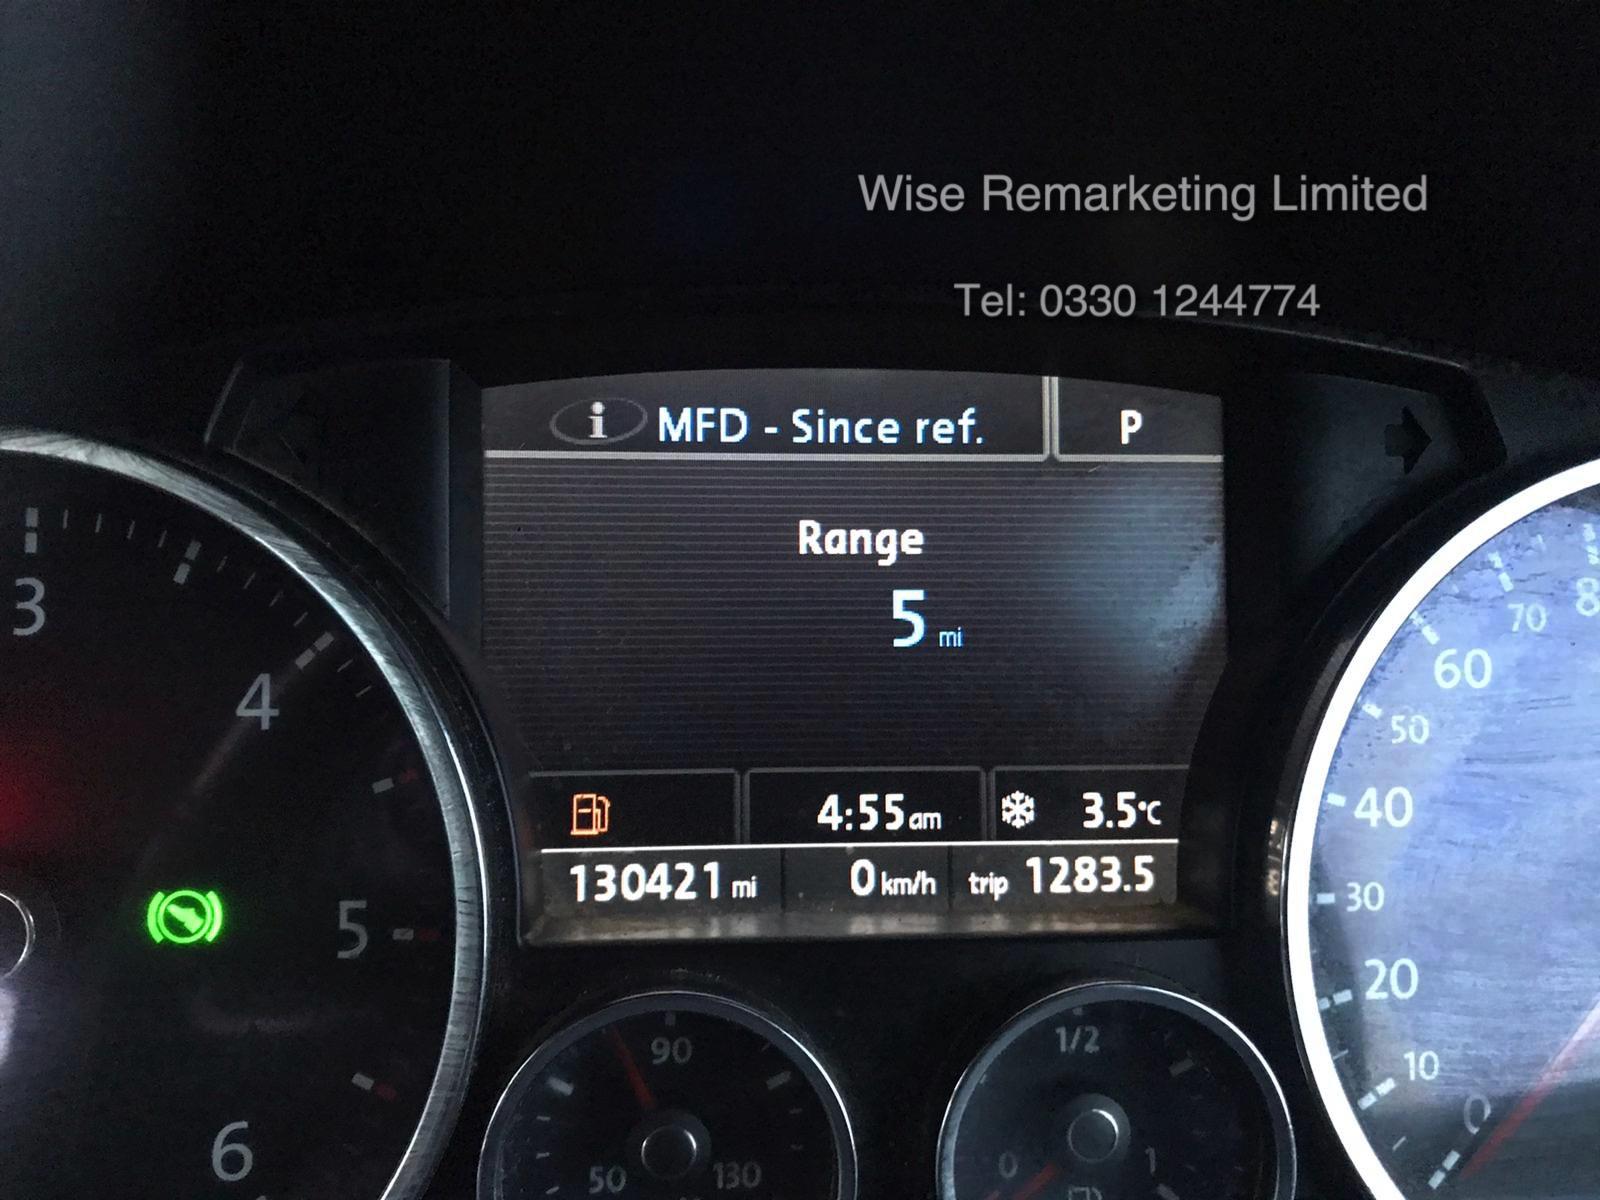 Lot 13a - Volkswagen Touareg 3.0 V6 TDI SE Special Equipment Auto - 2007 07 Reg - Full Leather - Sat Nav